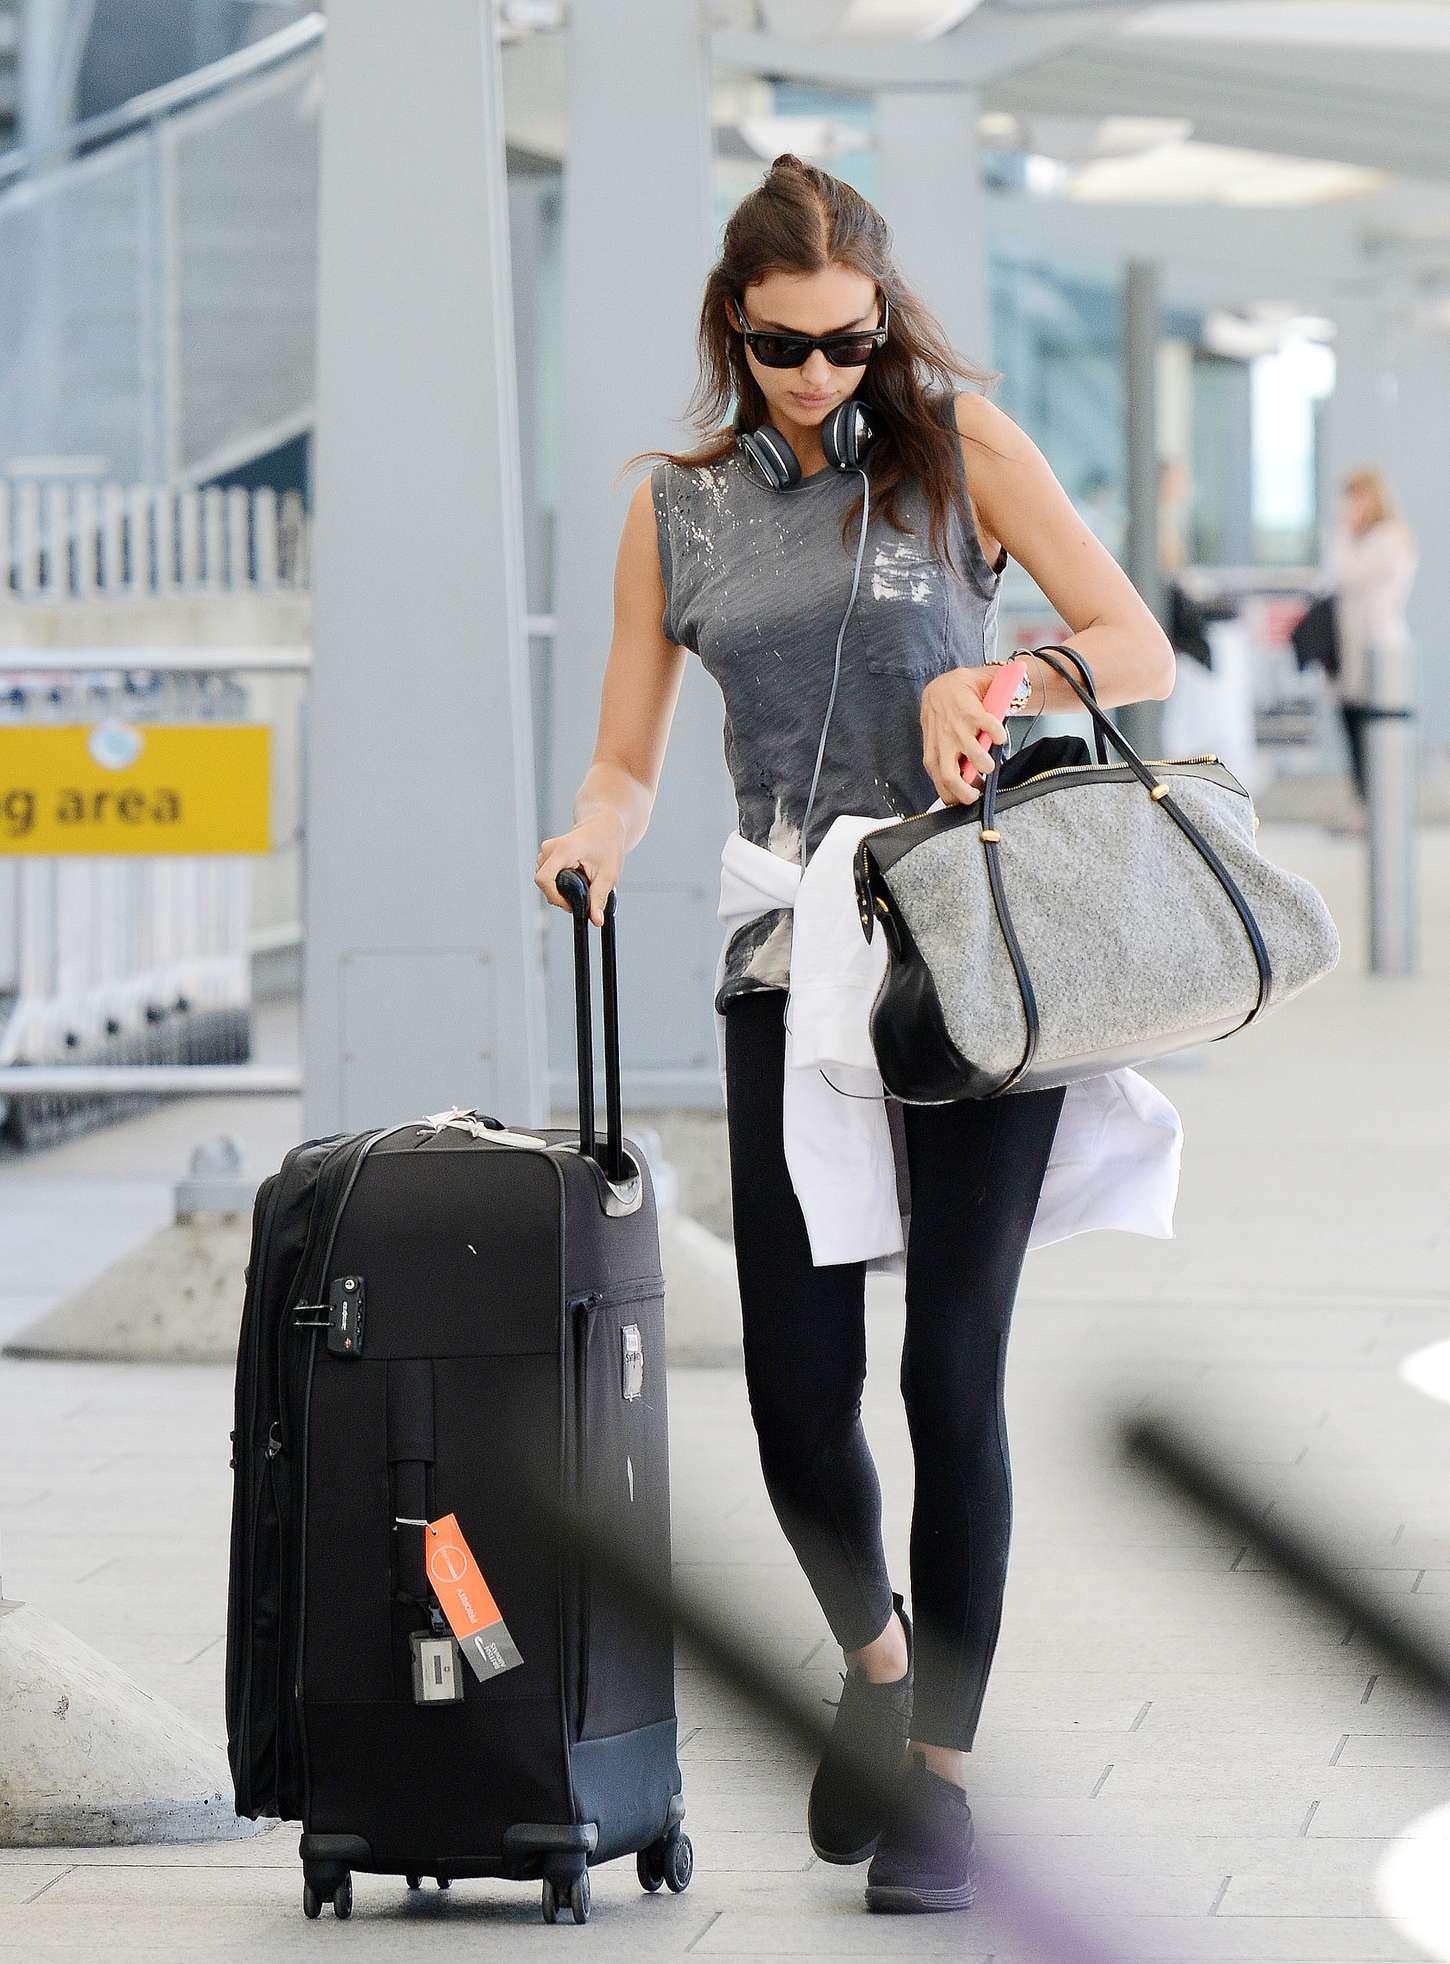 Irina Shayk 2015 : Irina Shayk in Leggings at Heathrow airport -09